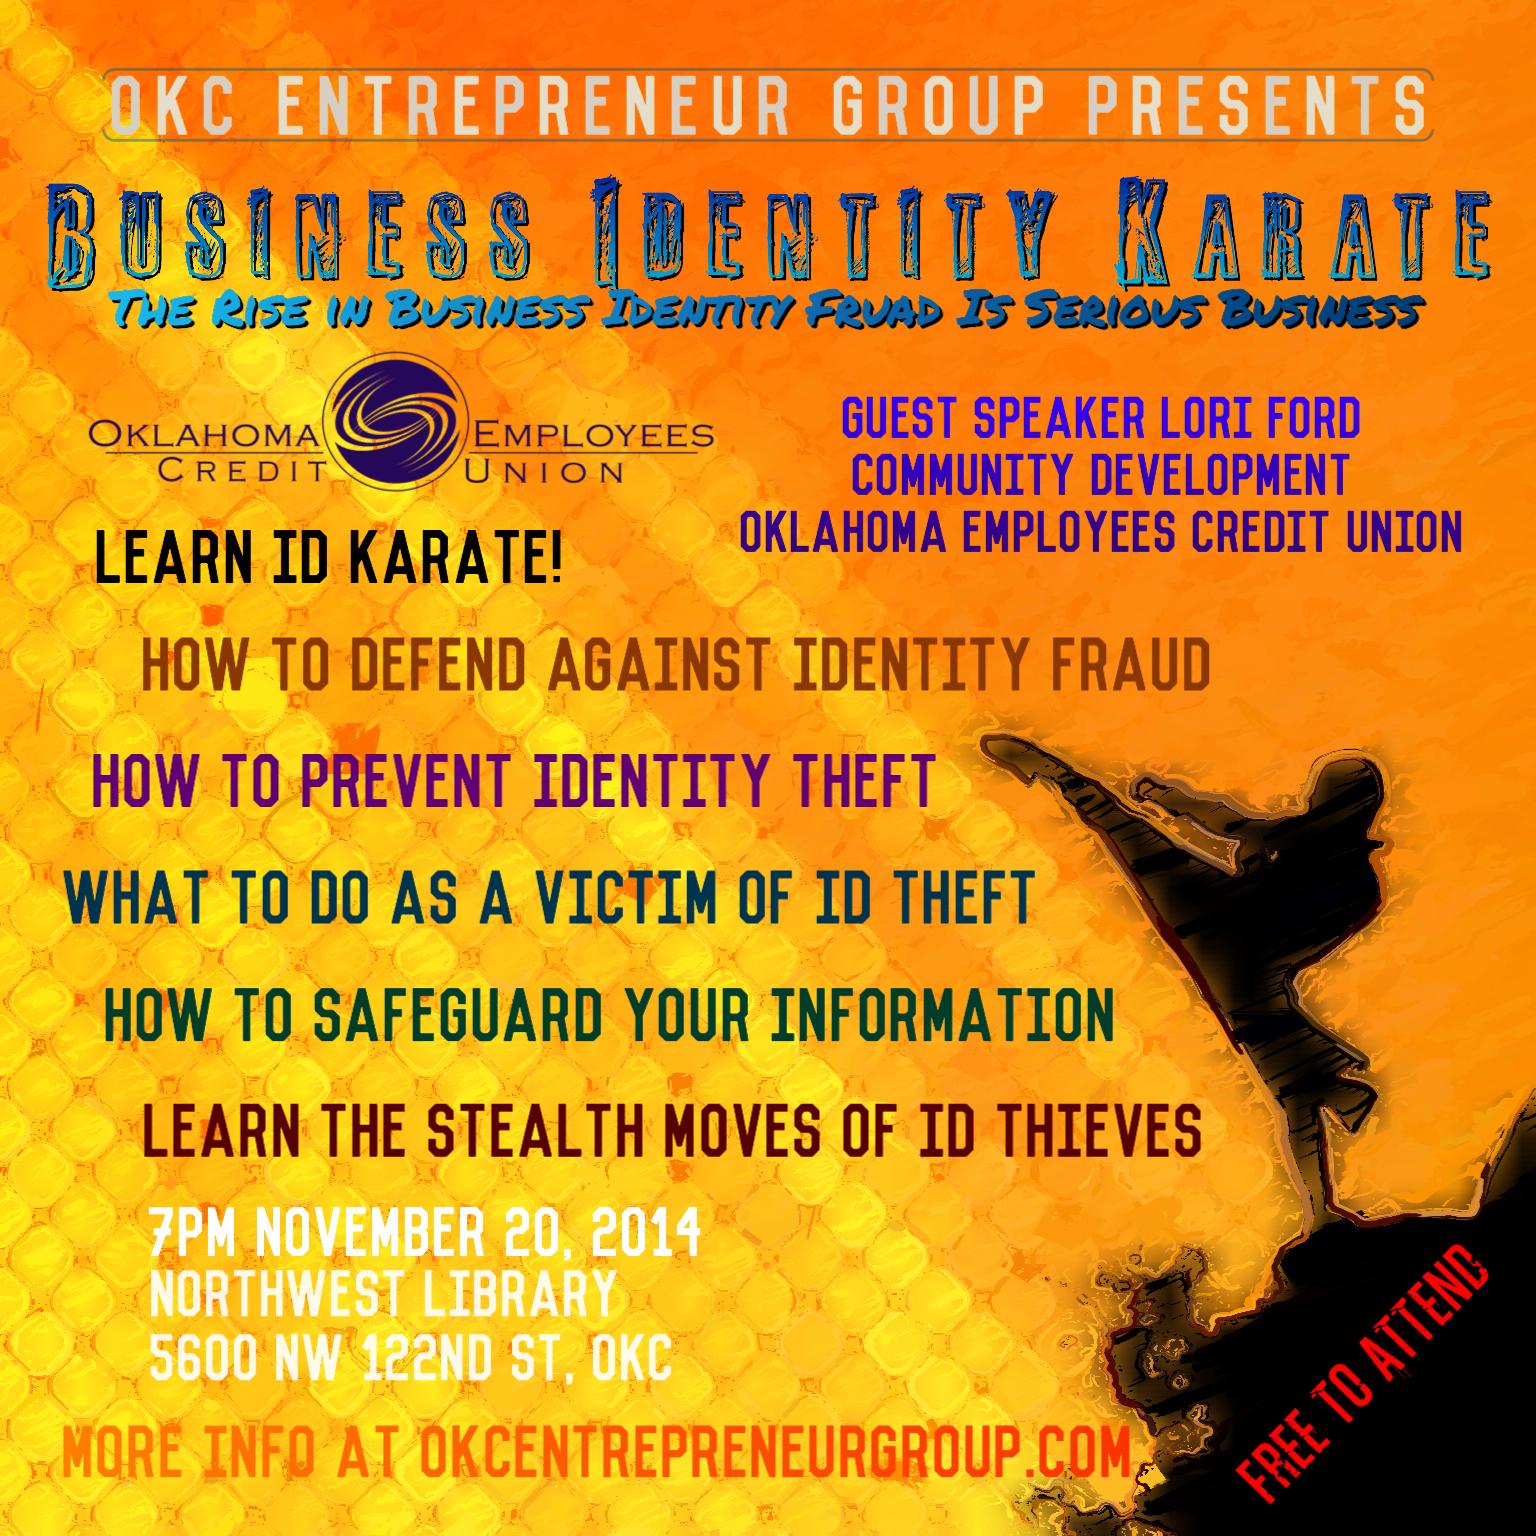 Business Identity Karate at OKCEntrepreneurGroup.com LG.jpg